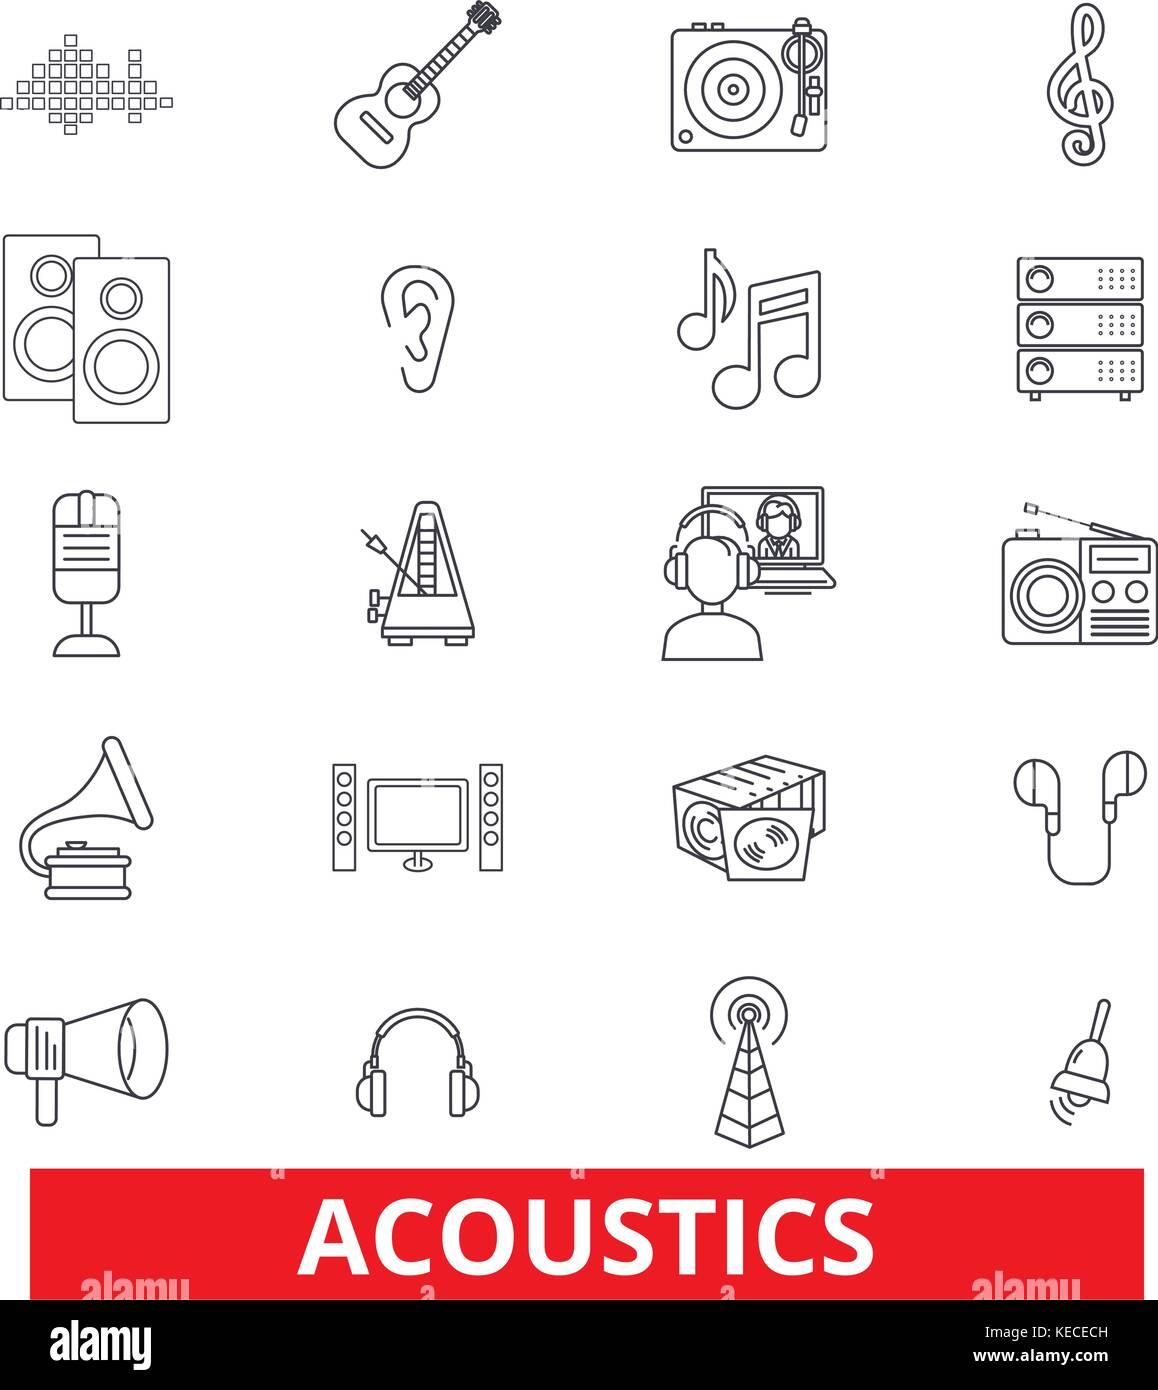 Akustik, Sound, Musik, Gitarre, E-Gitarrist, wave, Audio ...